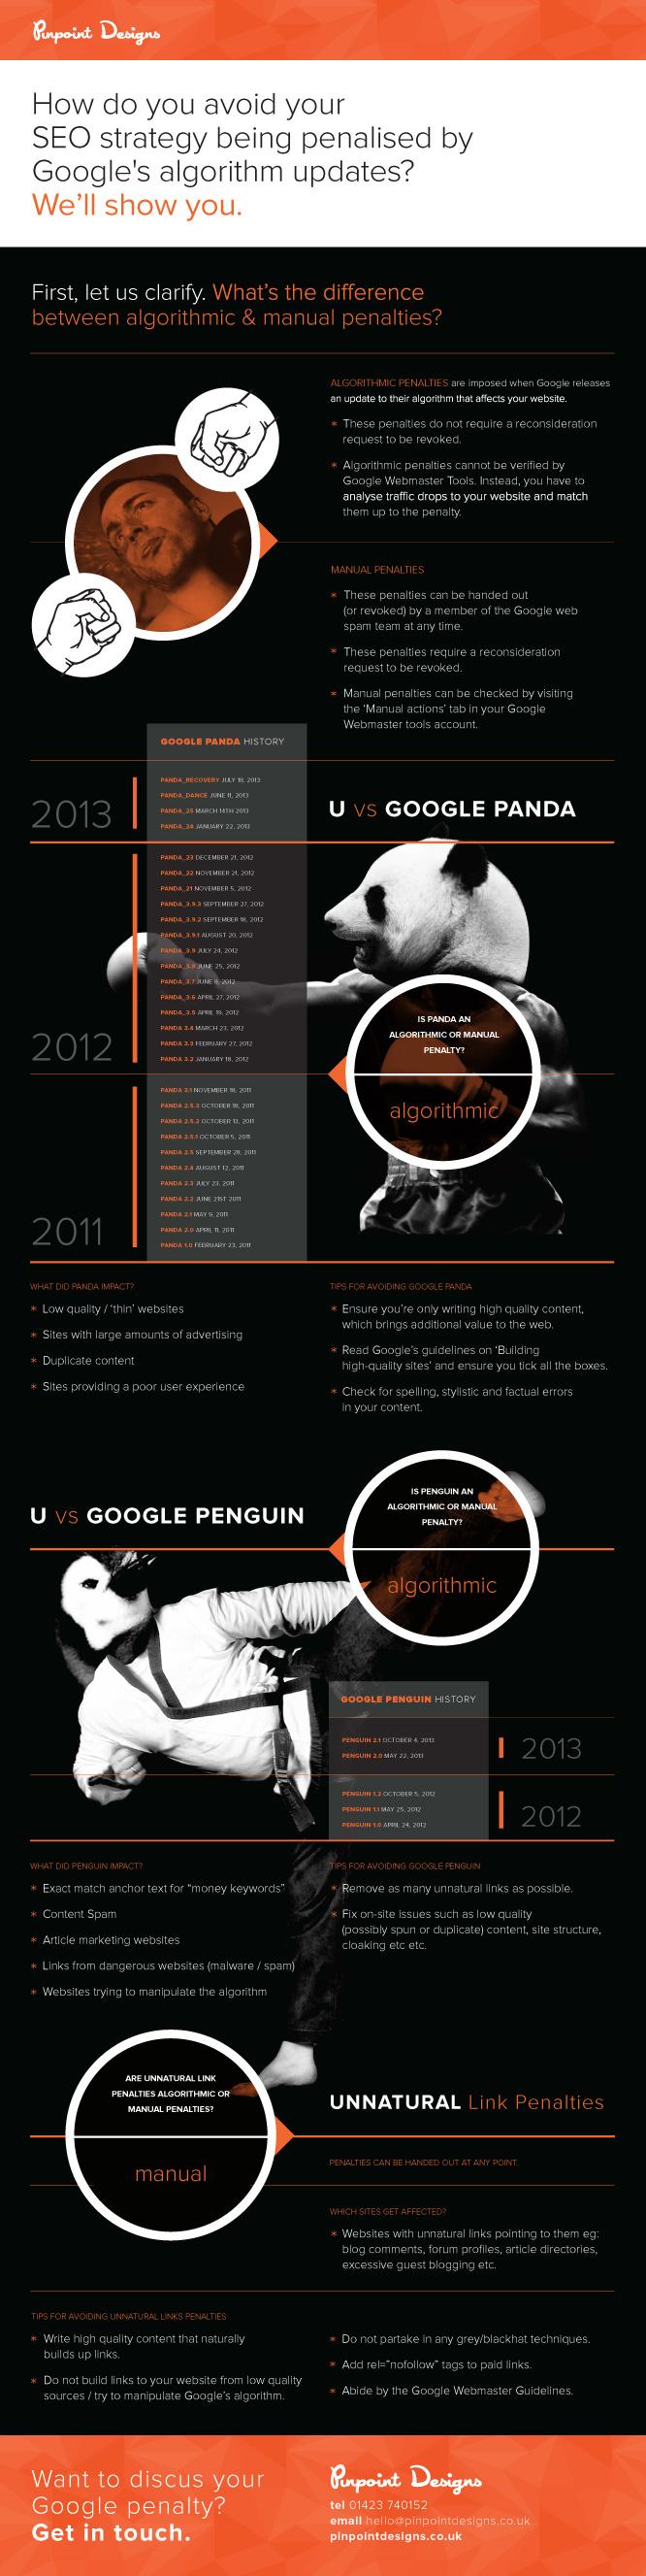 google-penalties-infographic